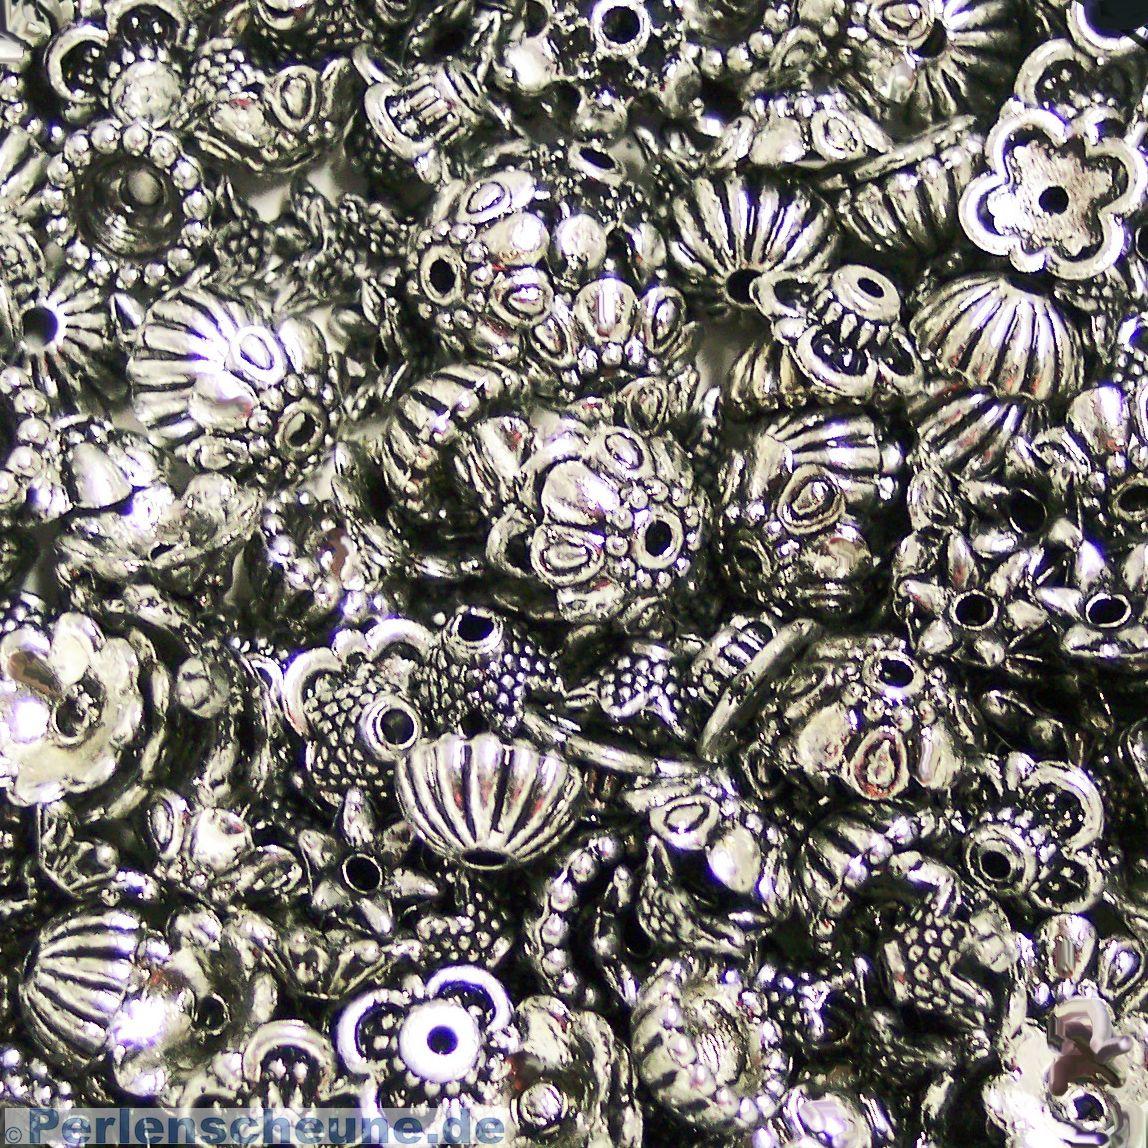 6,5 mm 50 kleine Perlkappen in silberfarben